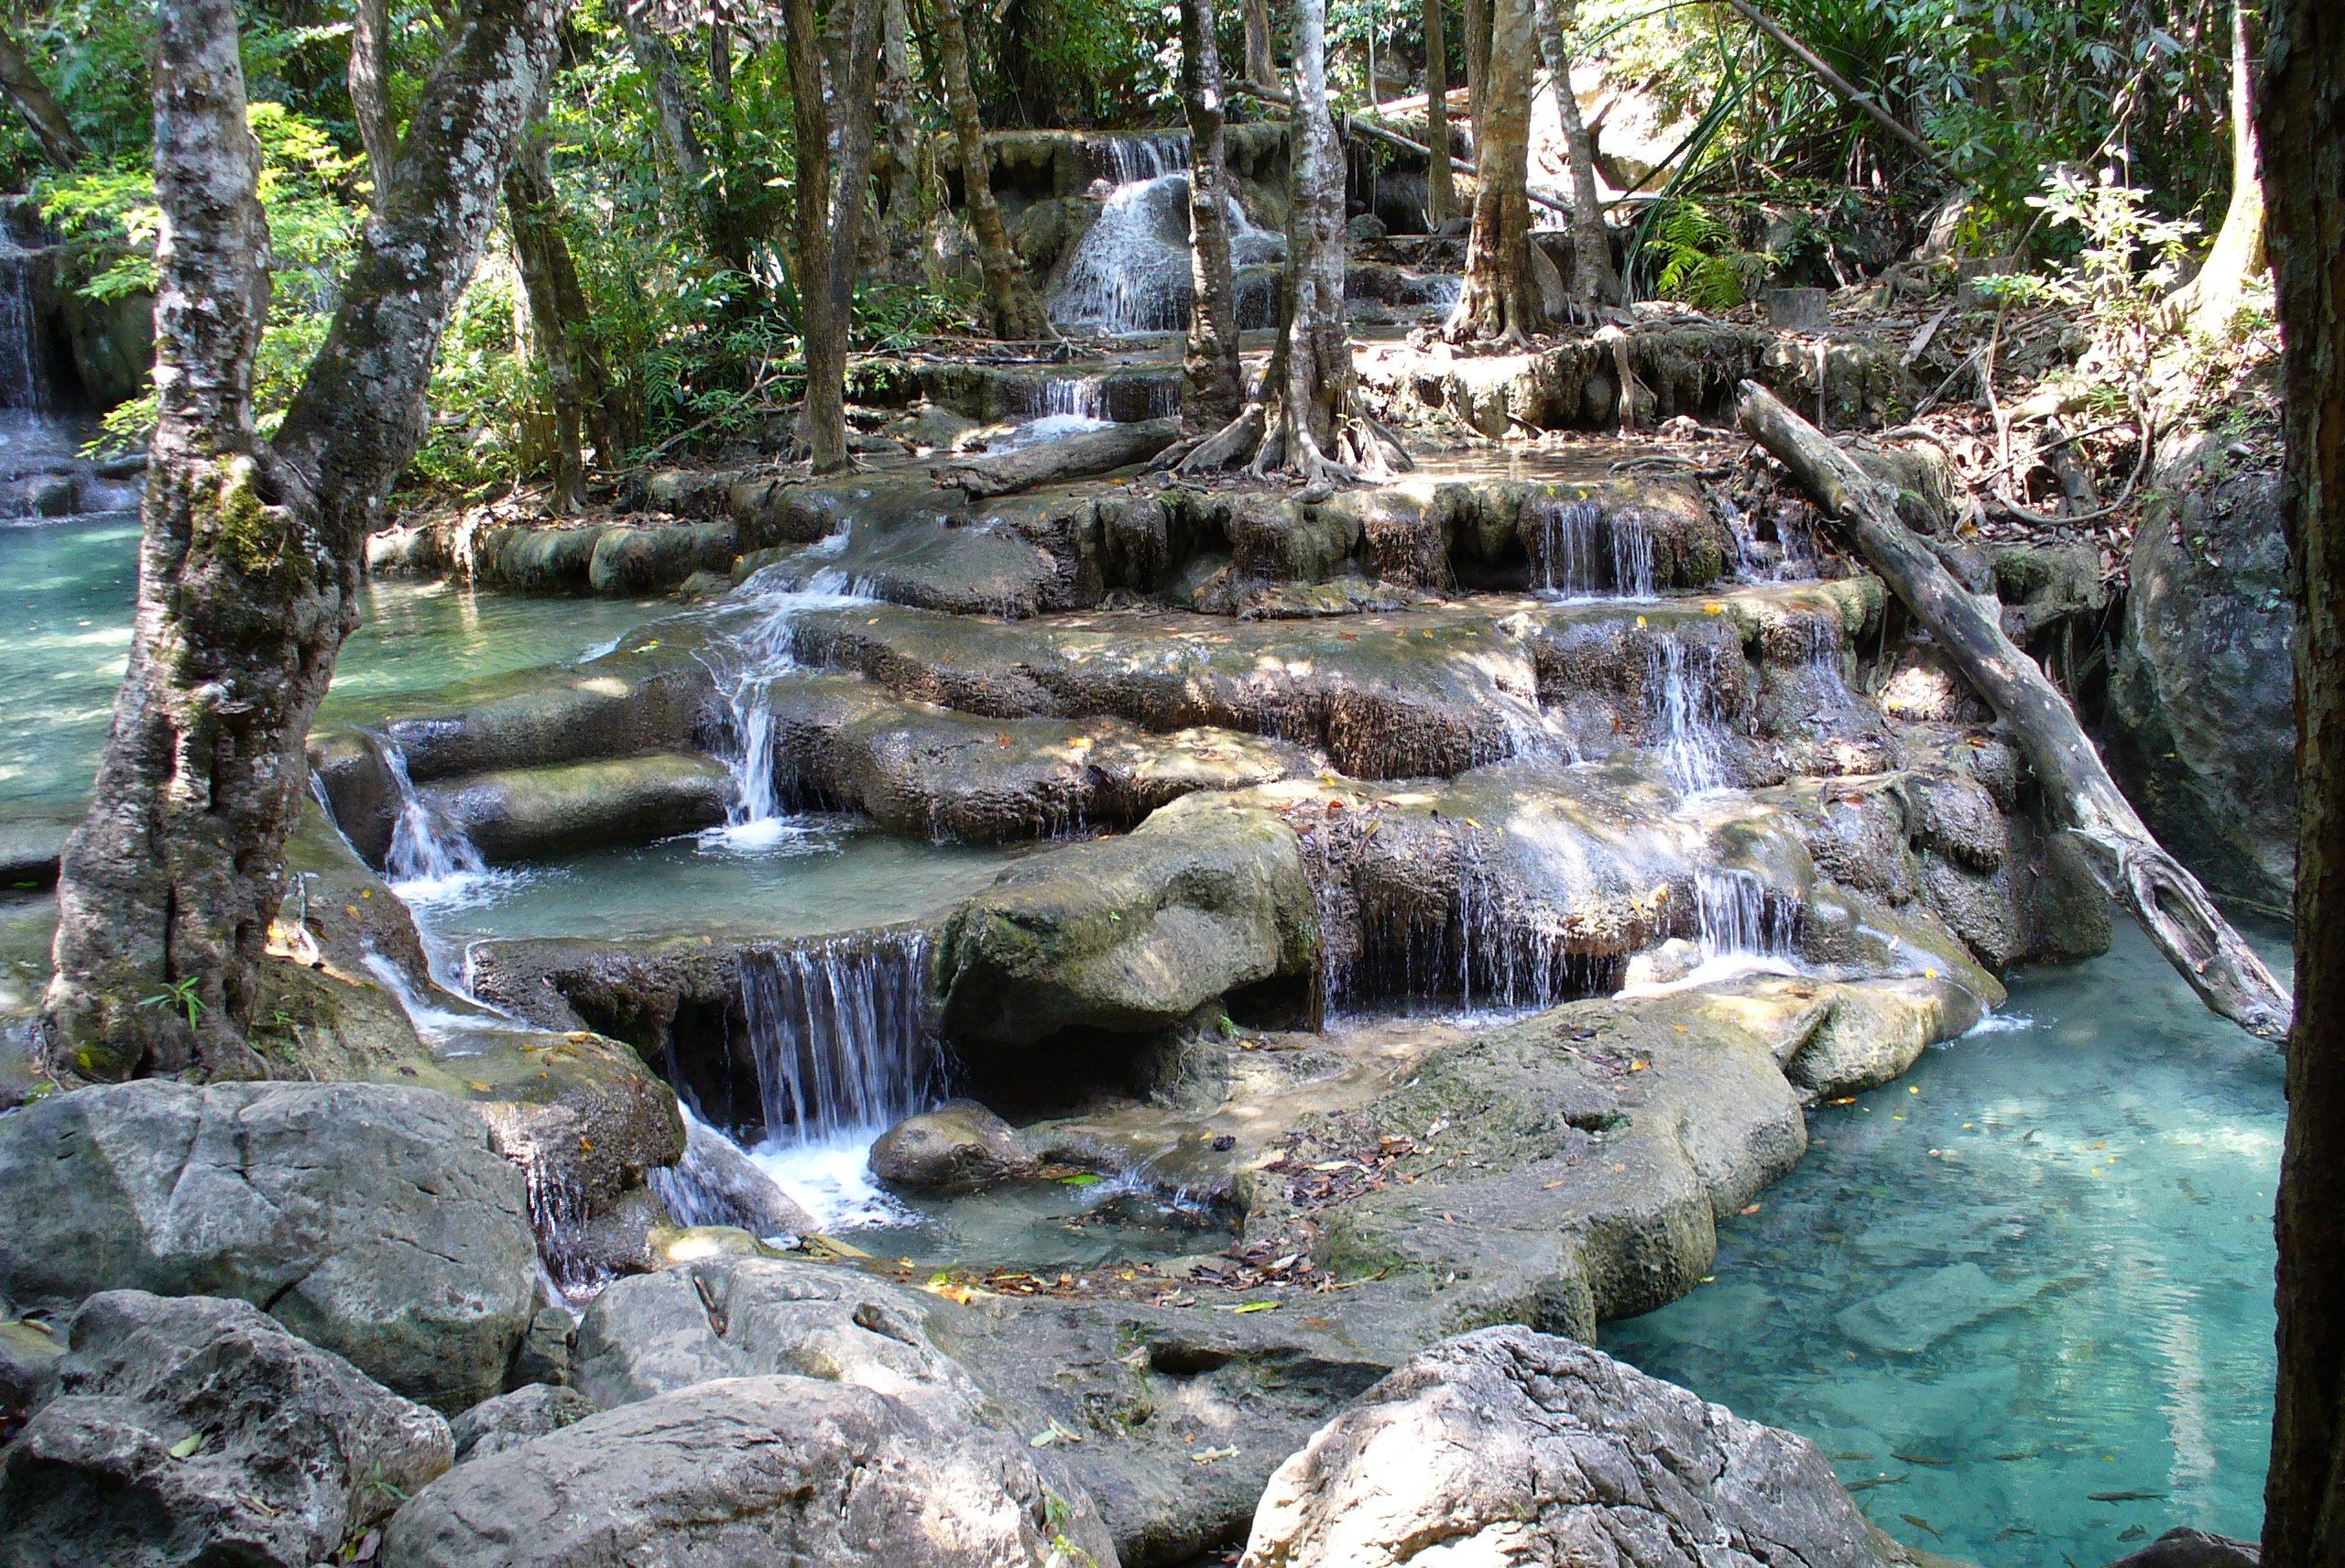 File:Erawan Falls 2.JPG - Wikimedia Commons